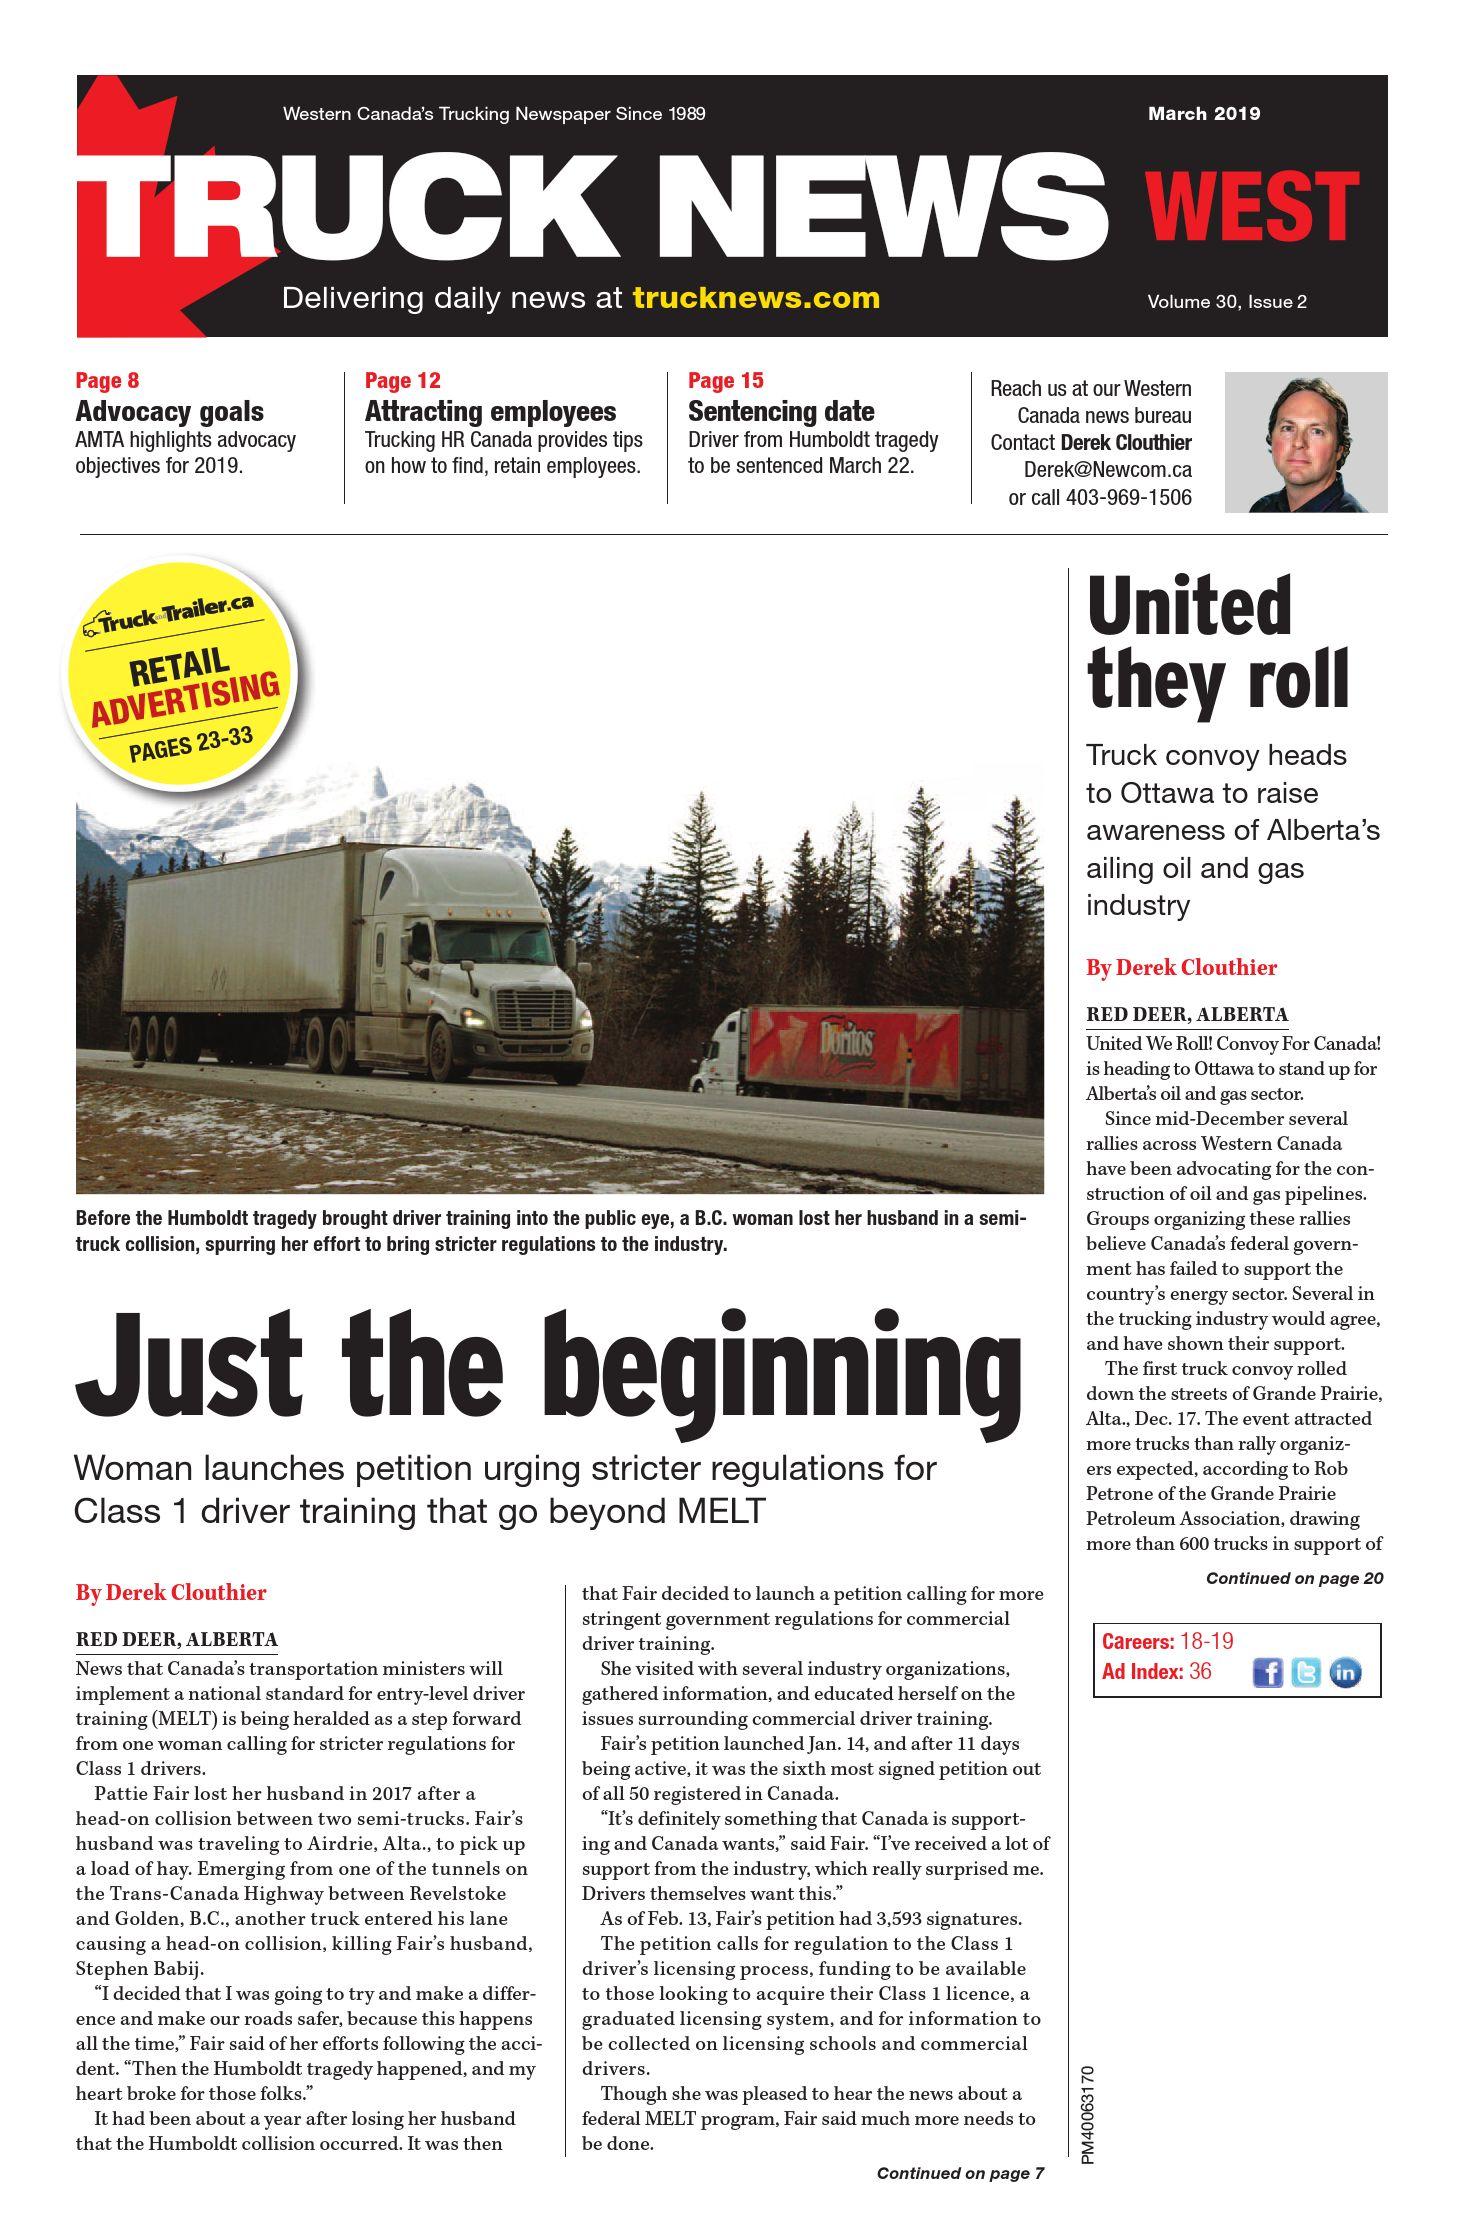 Truck News West – 1 mars 2019